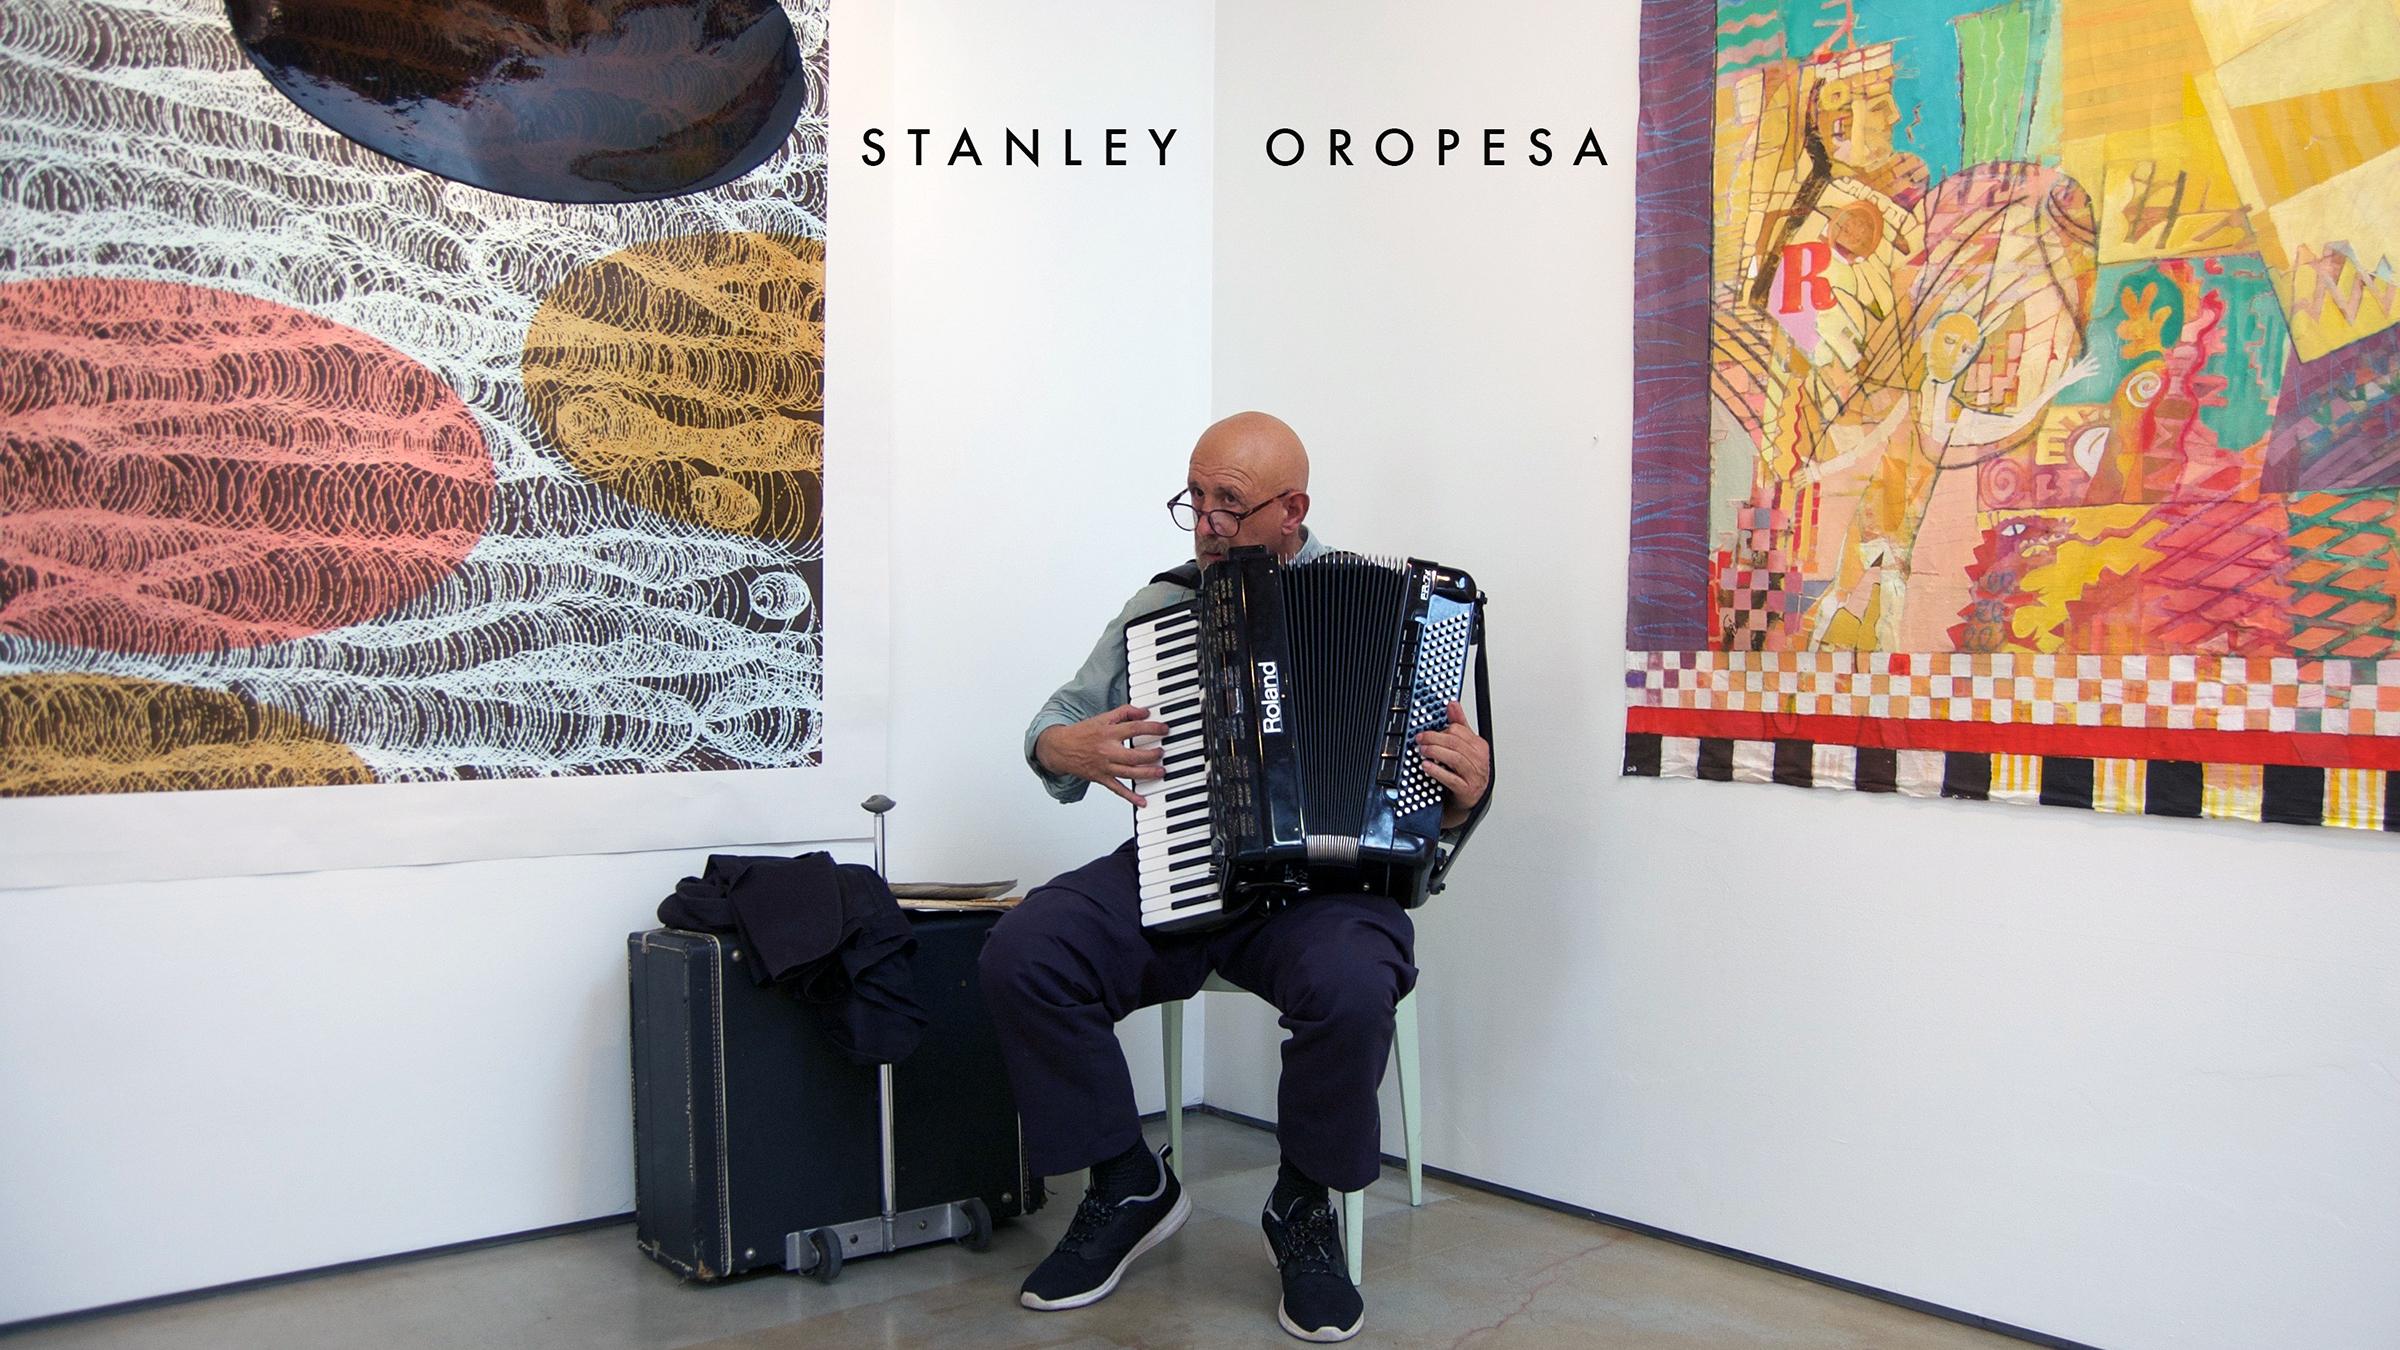 EVENT 4: STANLEY OROPESA (#1)